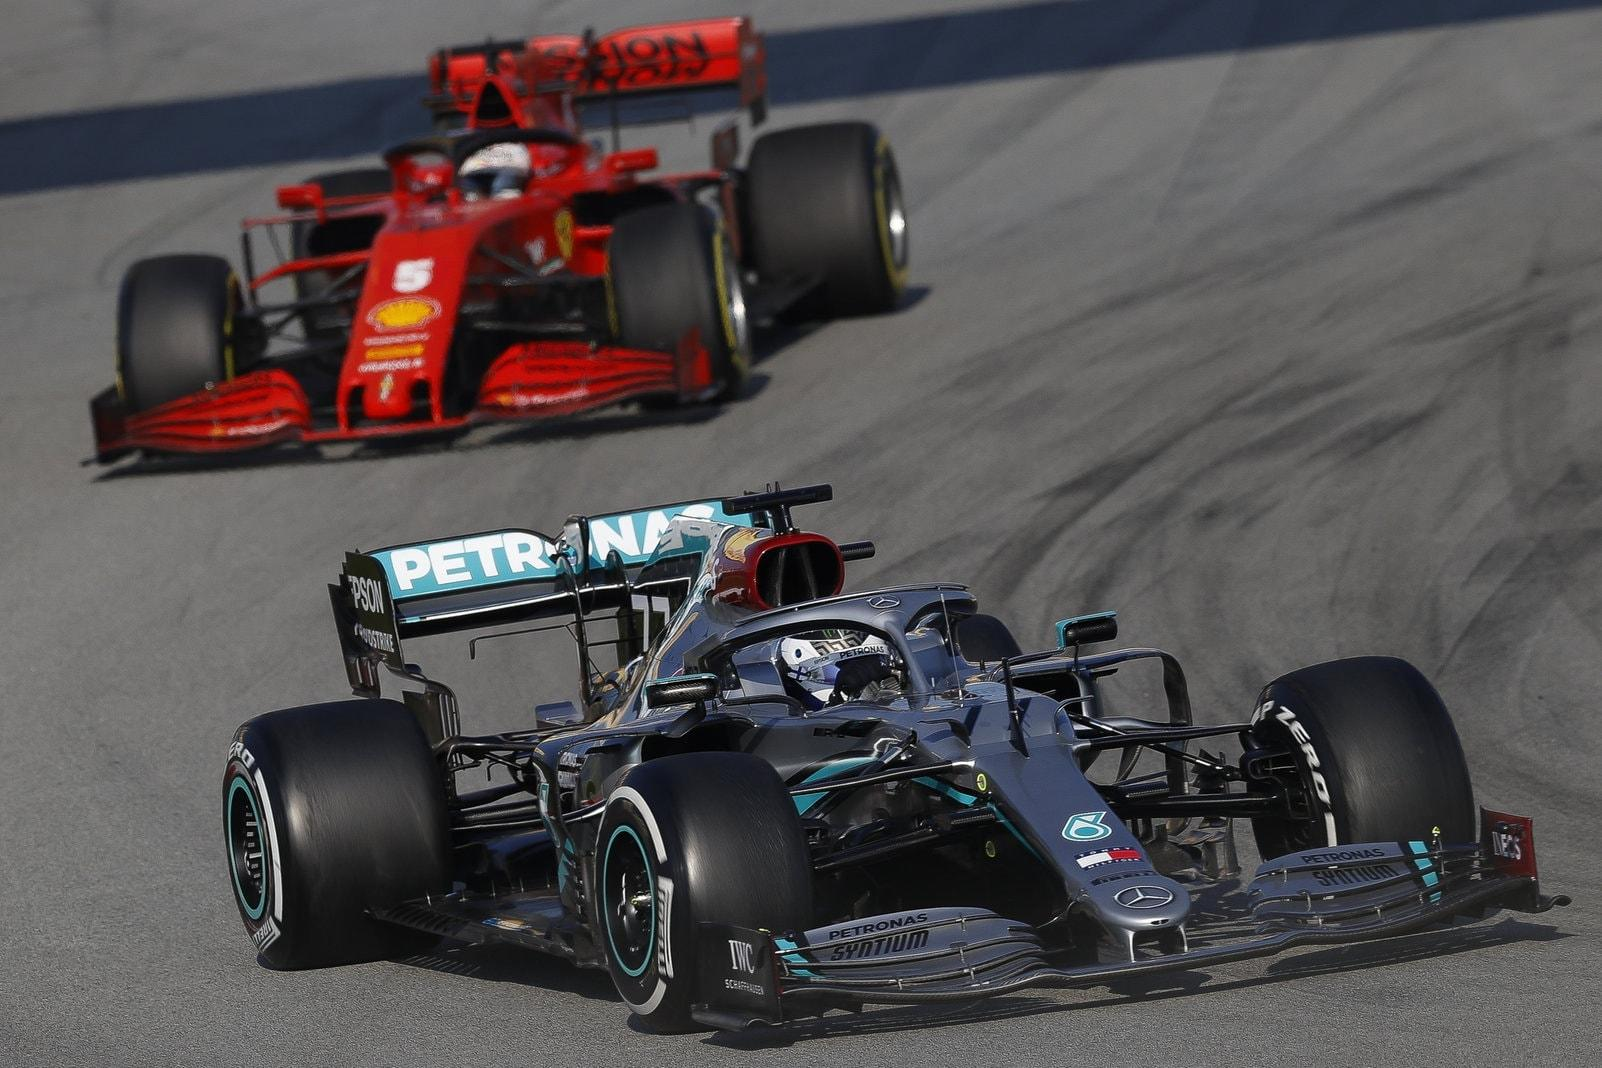 Größter Formel 1 Fahrer Körpergröße